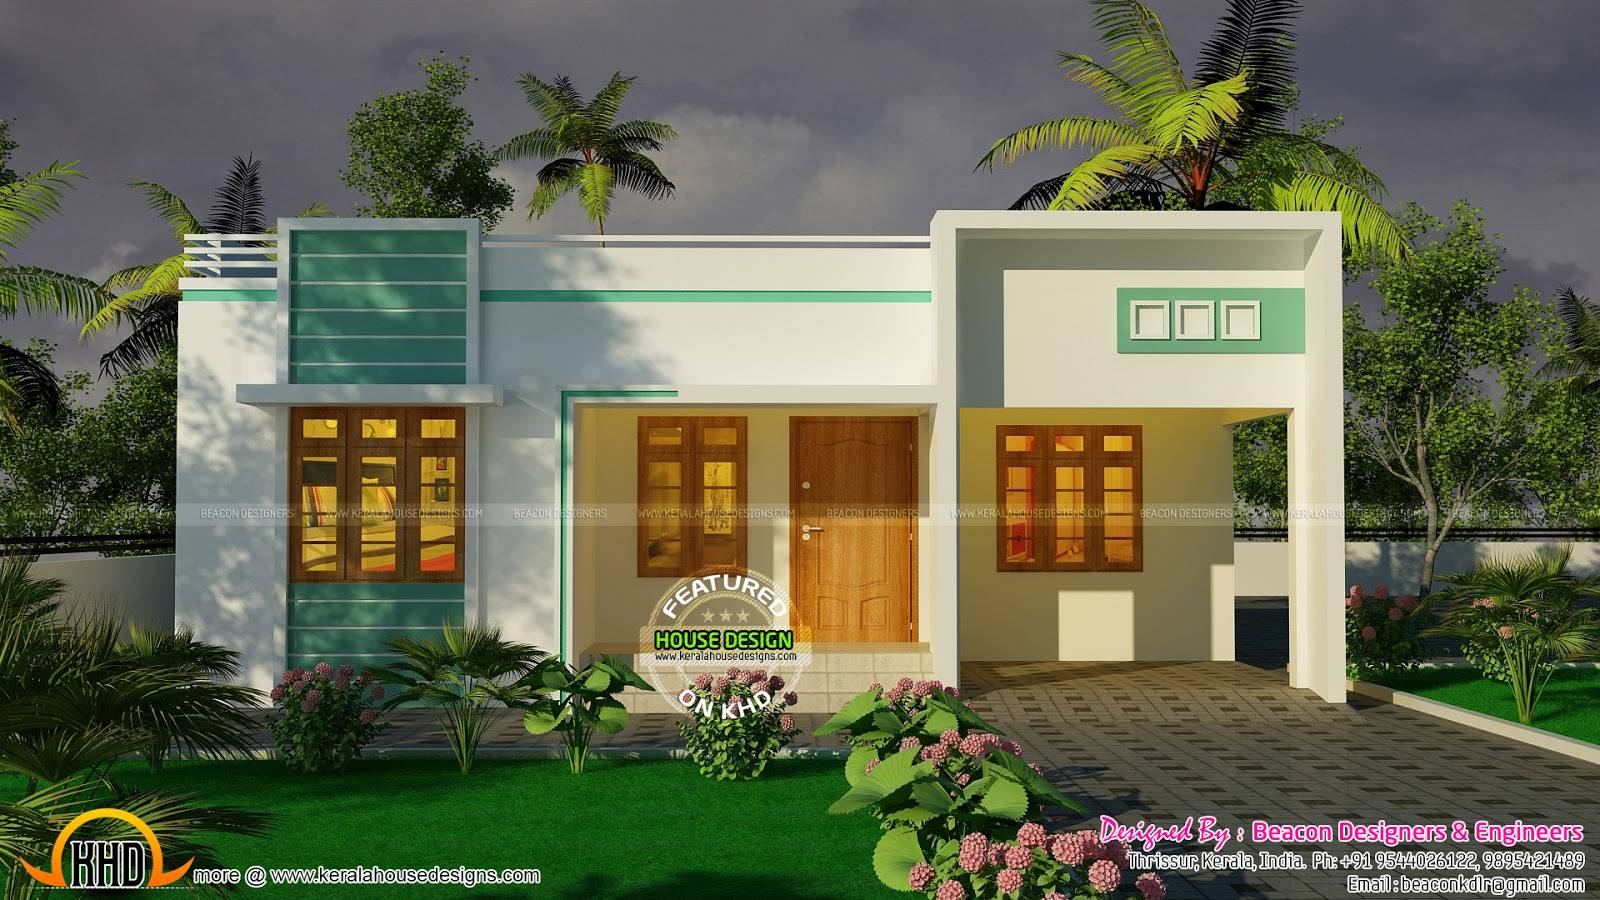 Bedroom Small Budget House Plan Kerala Home Design Floor Plans 412779 Small House Plan Ch45 Home Design